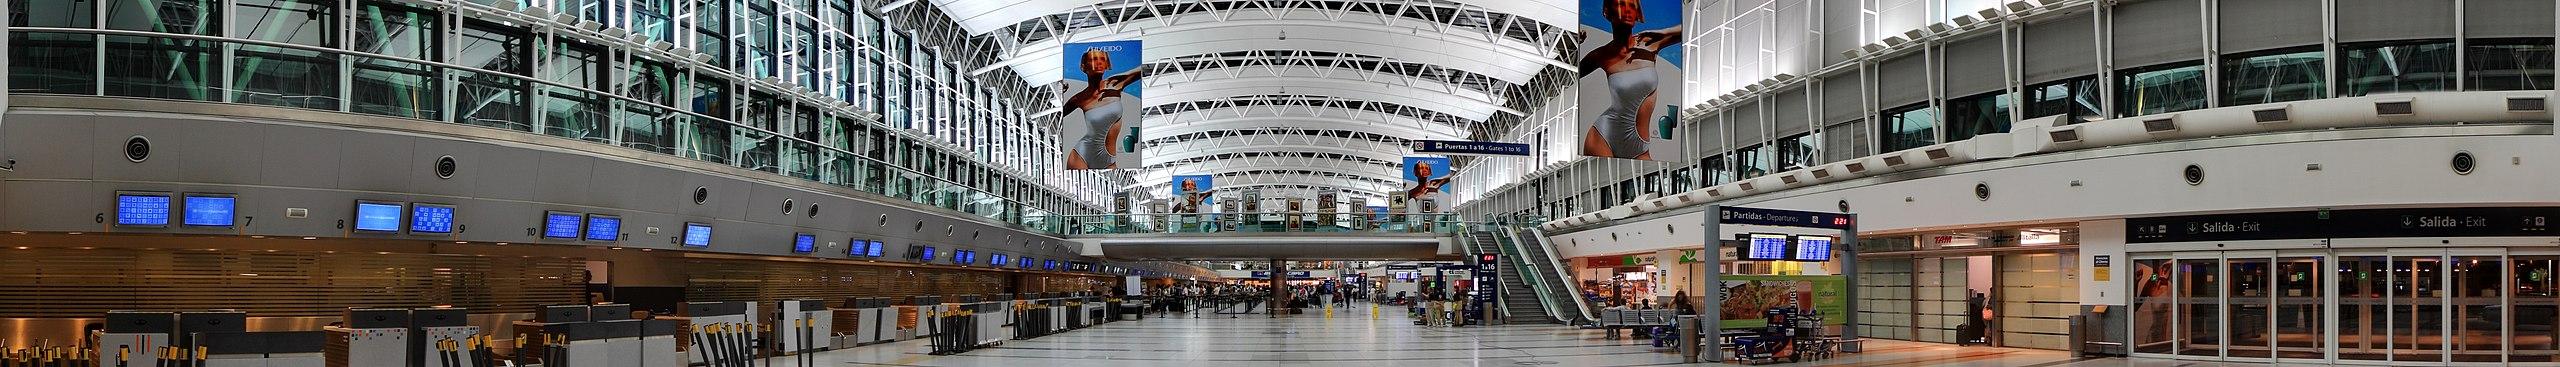 Ministro Pistarini International Airport – Travel guide at Wikivoyage